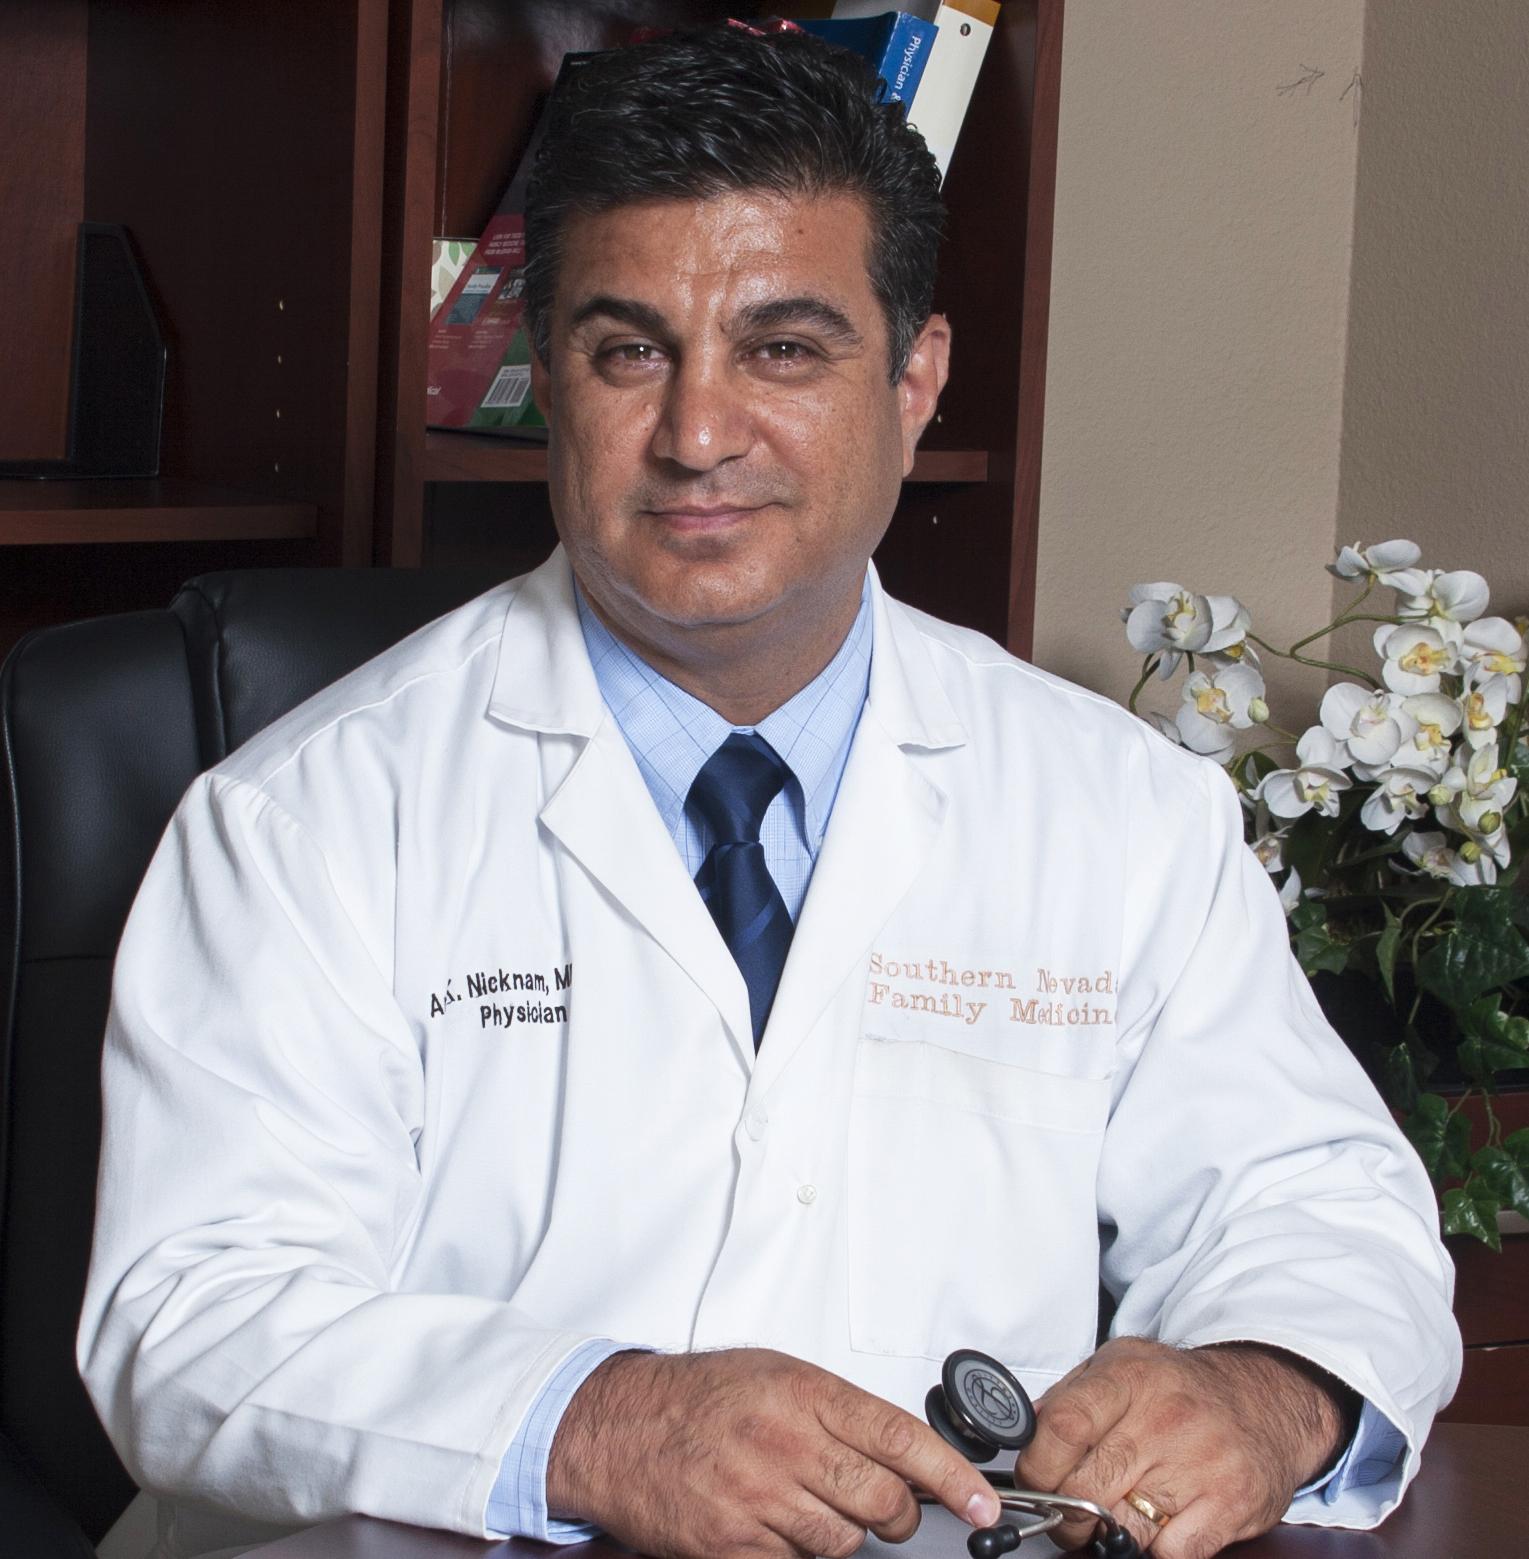 Dr. Amir Nicknam